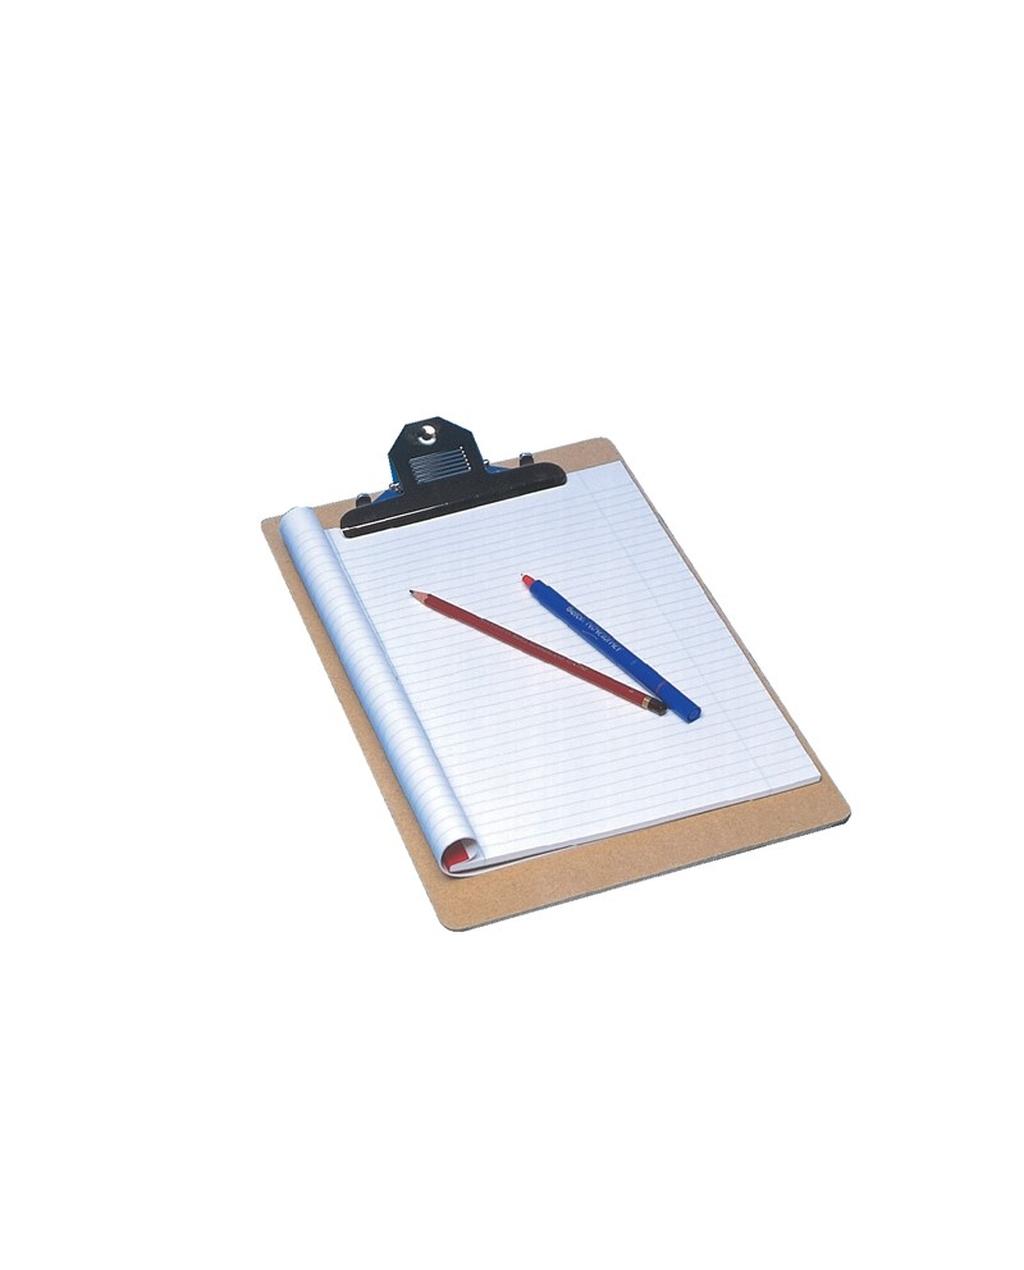 A4 Hardboard Clipboard